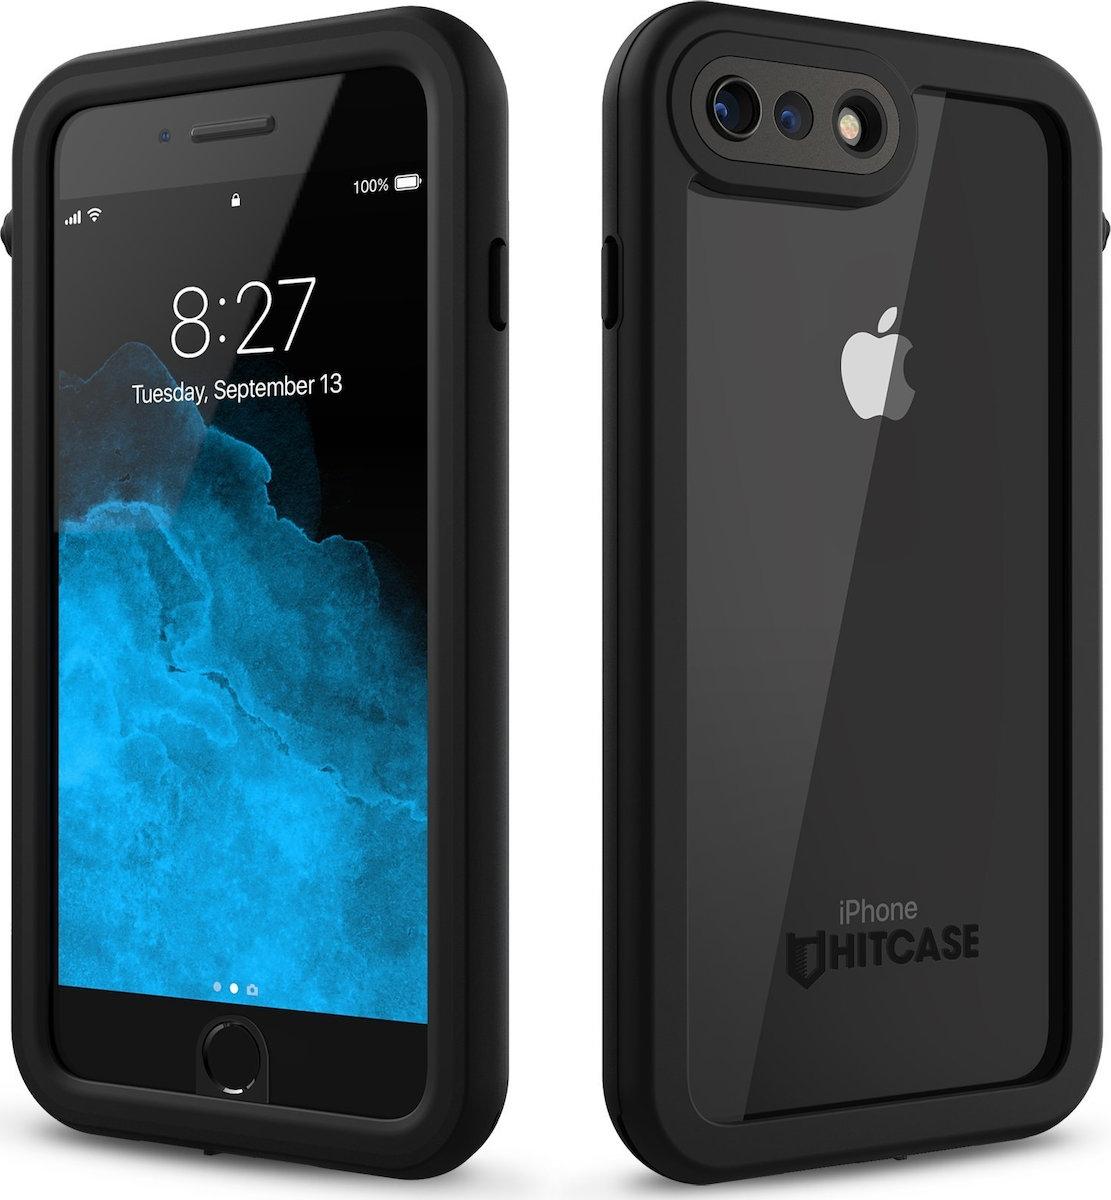 Hitcase Splash Αδιάβροχη Ανθεκτική Θήκη iPhone 7 Plus / 8 Plus - Black (HC81100)